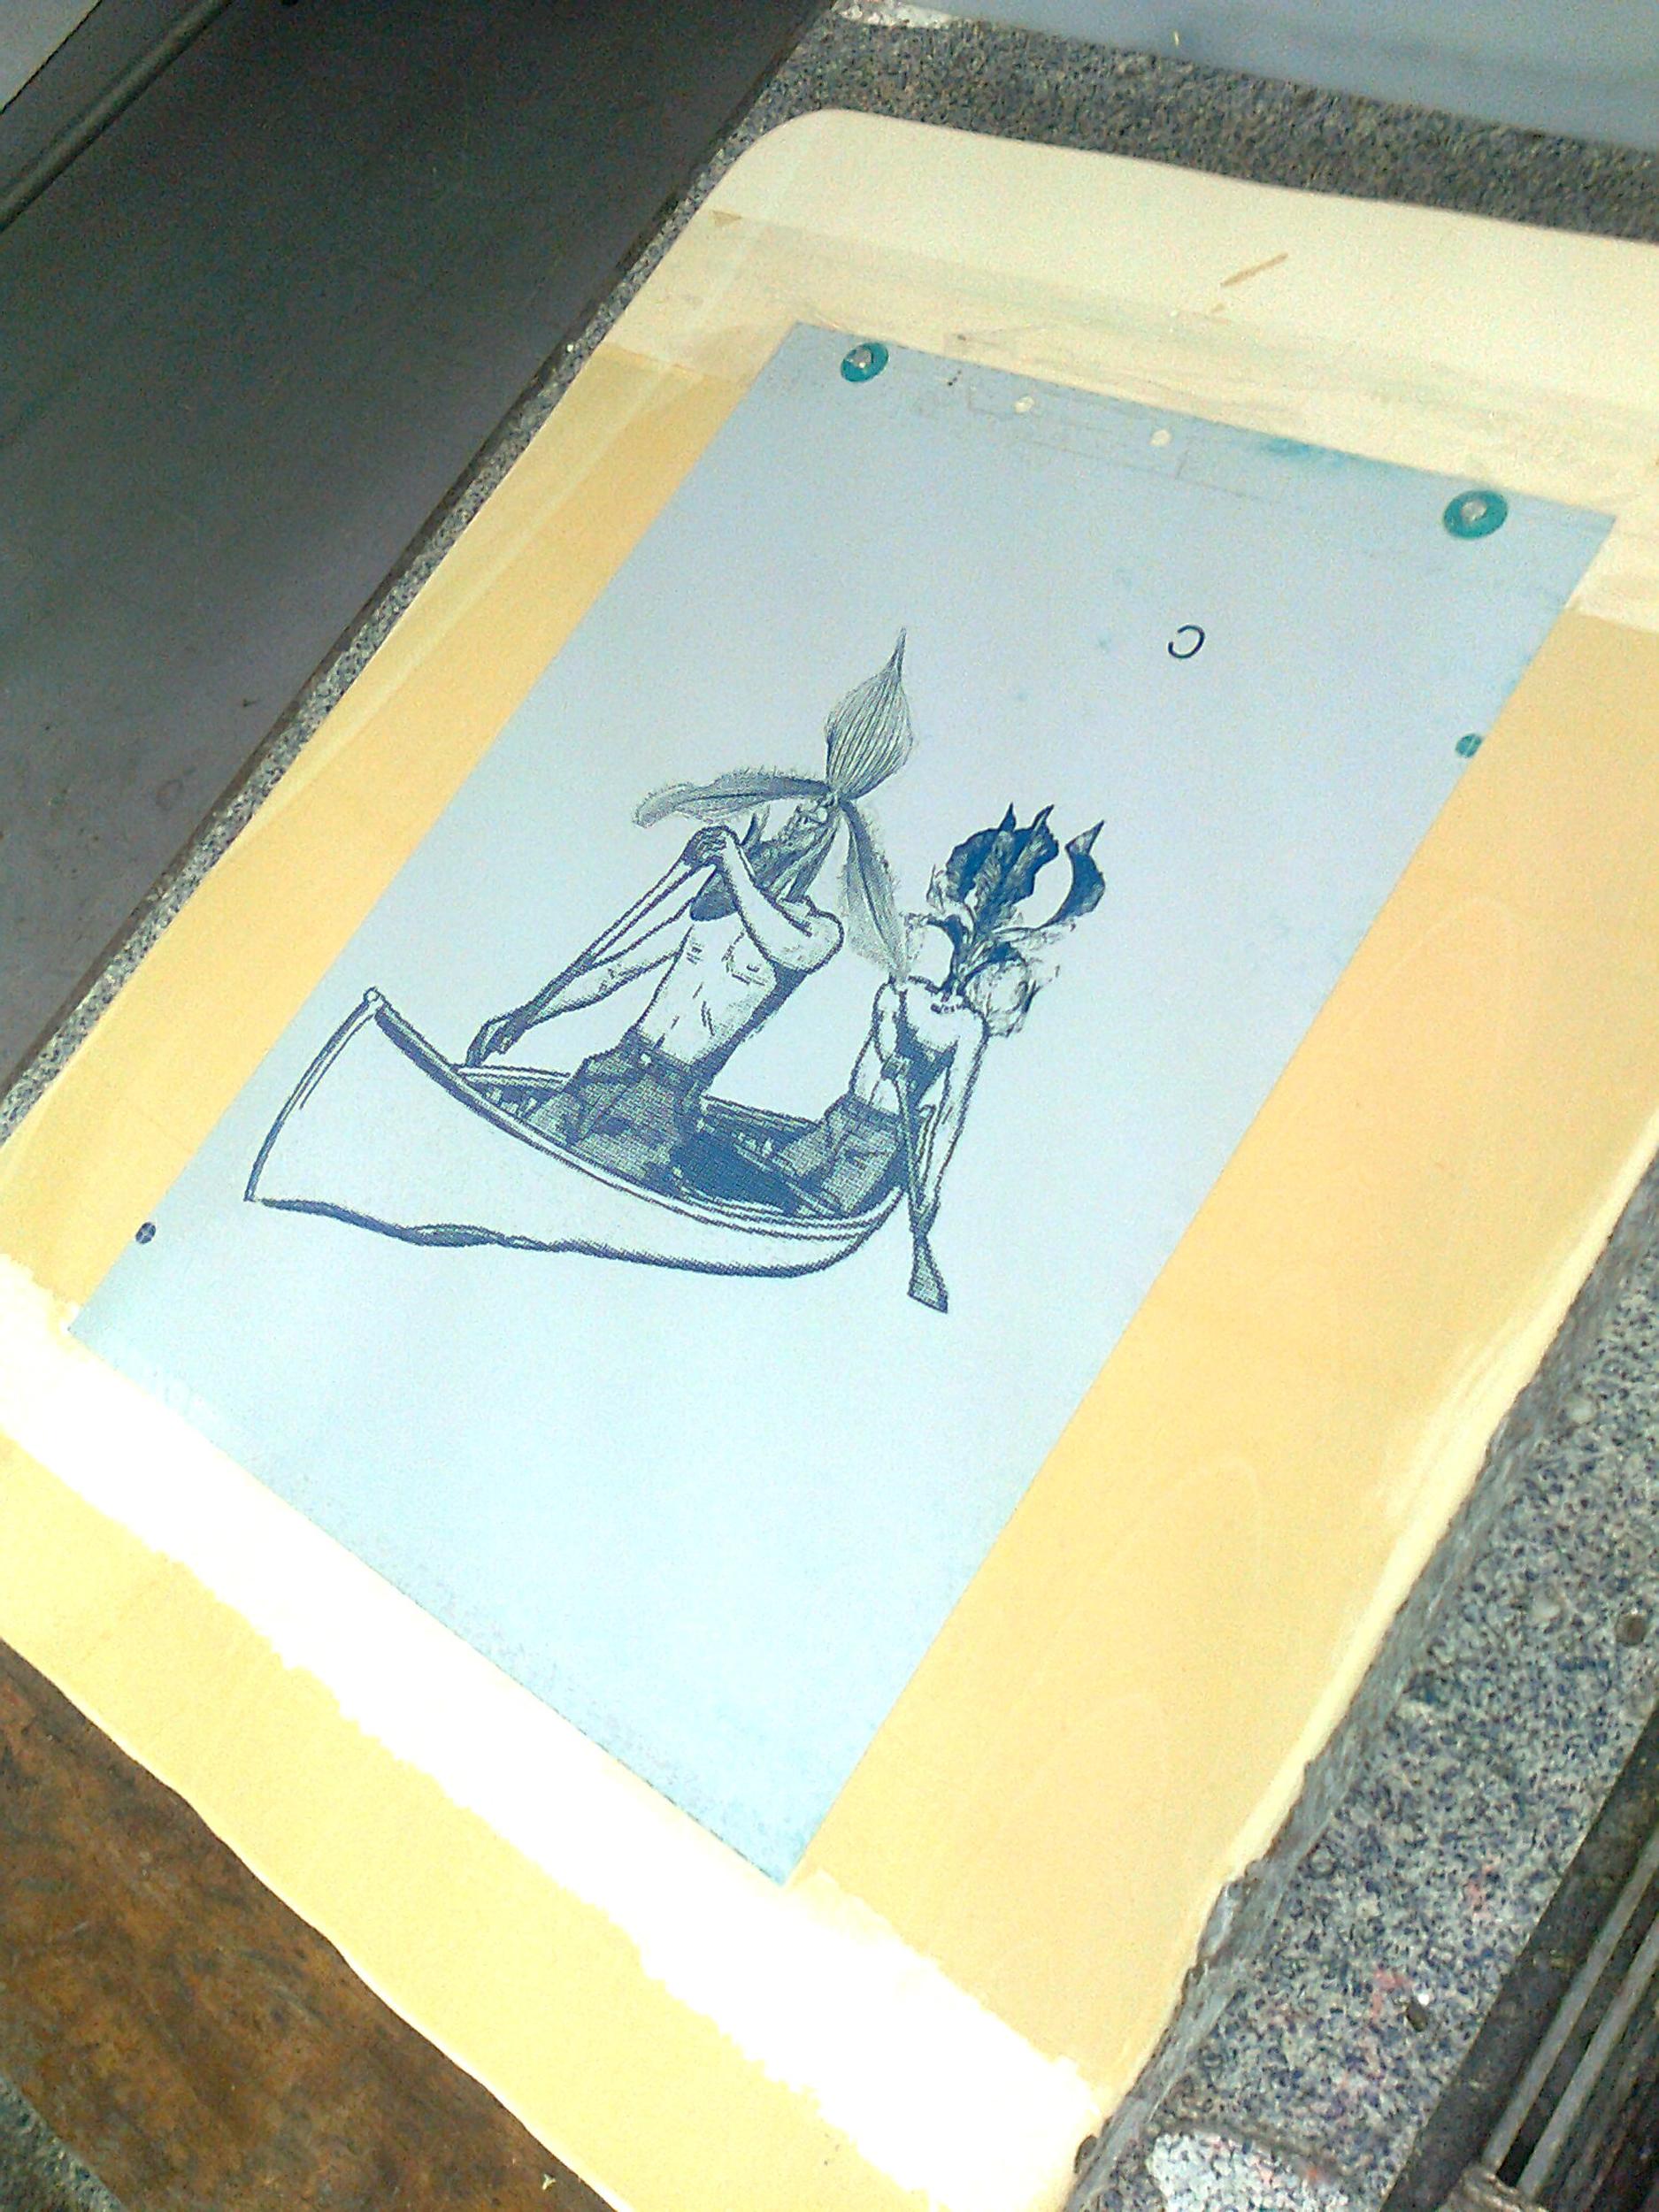 testimonial-i-iii-iii-progress-documentation-cellphone-sketchbook-038.jpg